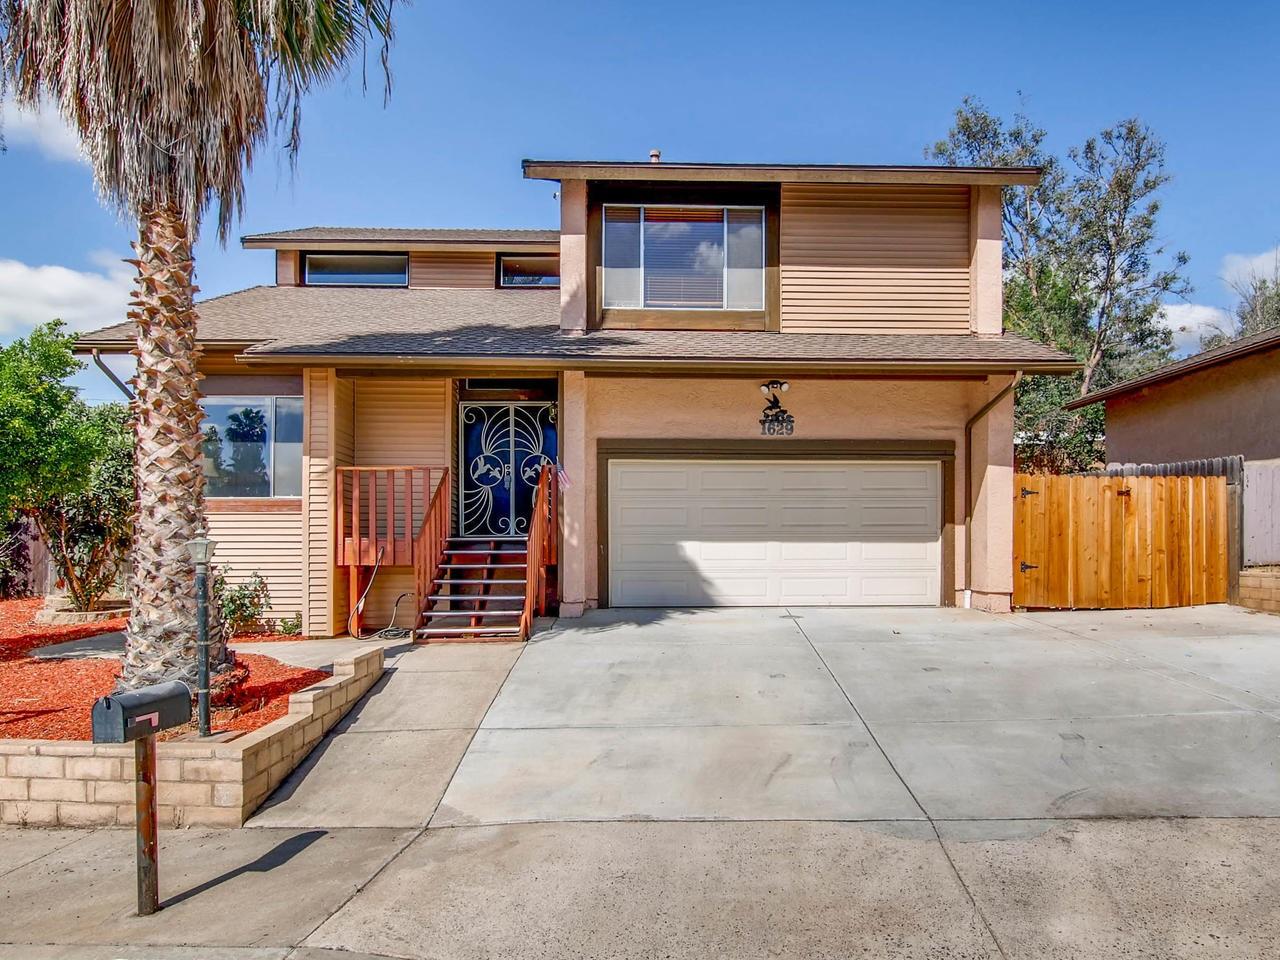 1629 Hawk Ridge Place, Escondido, CA 92027